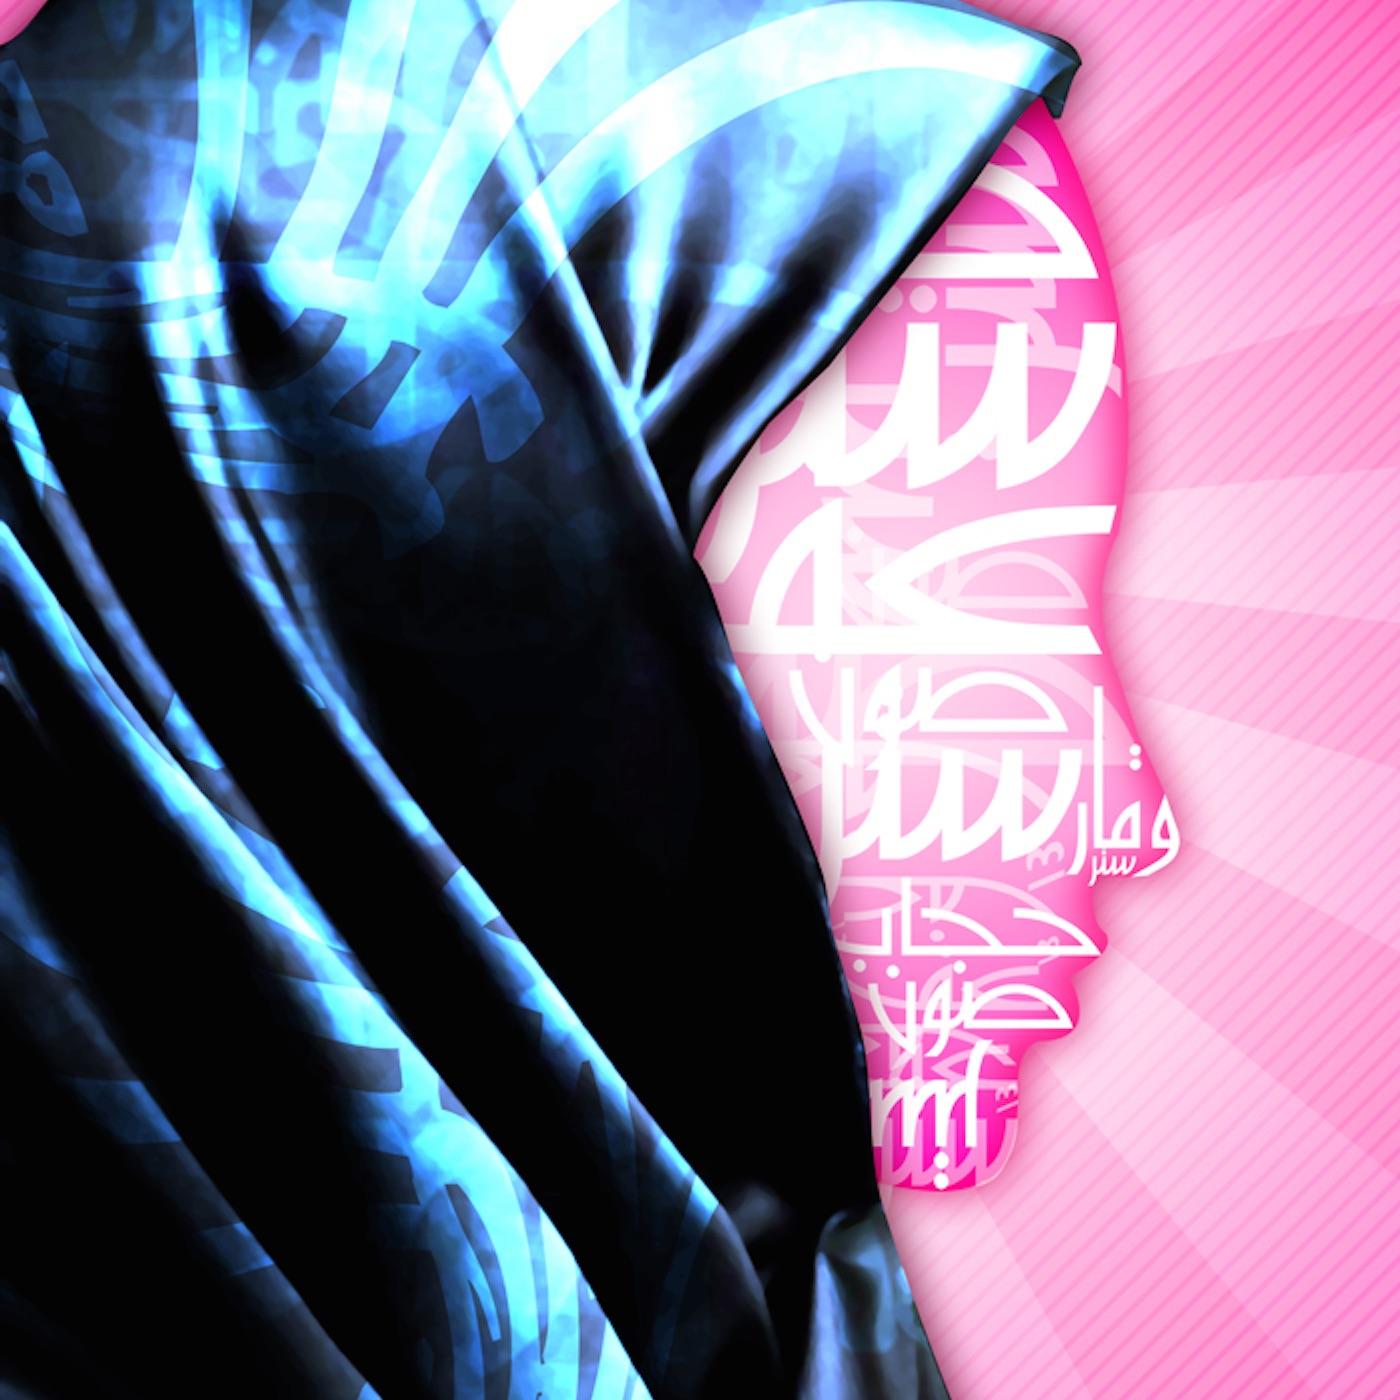 Hijabi Diaries